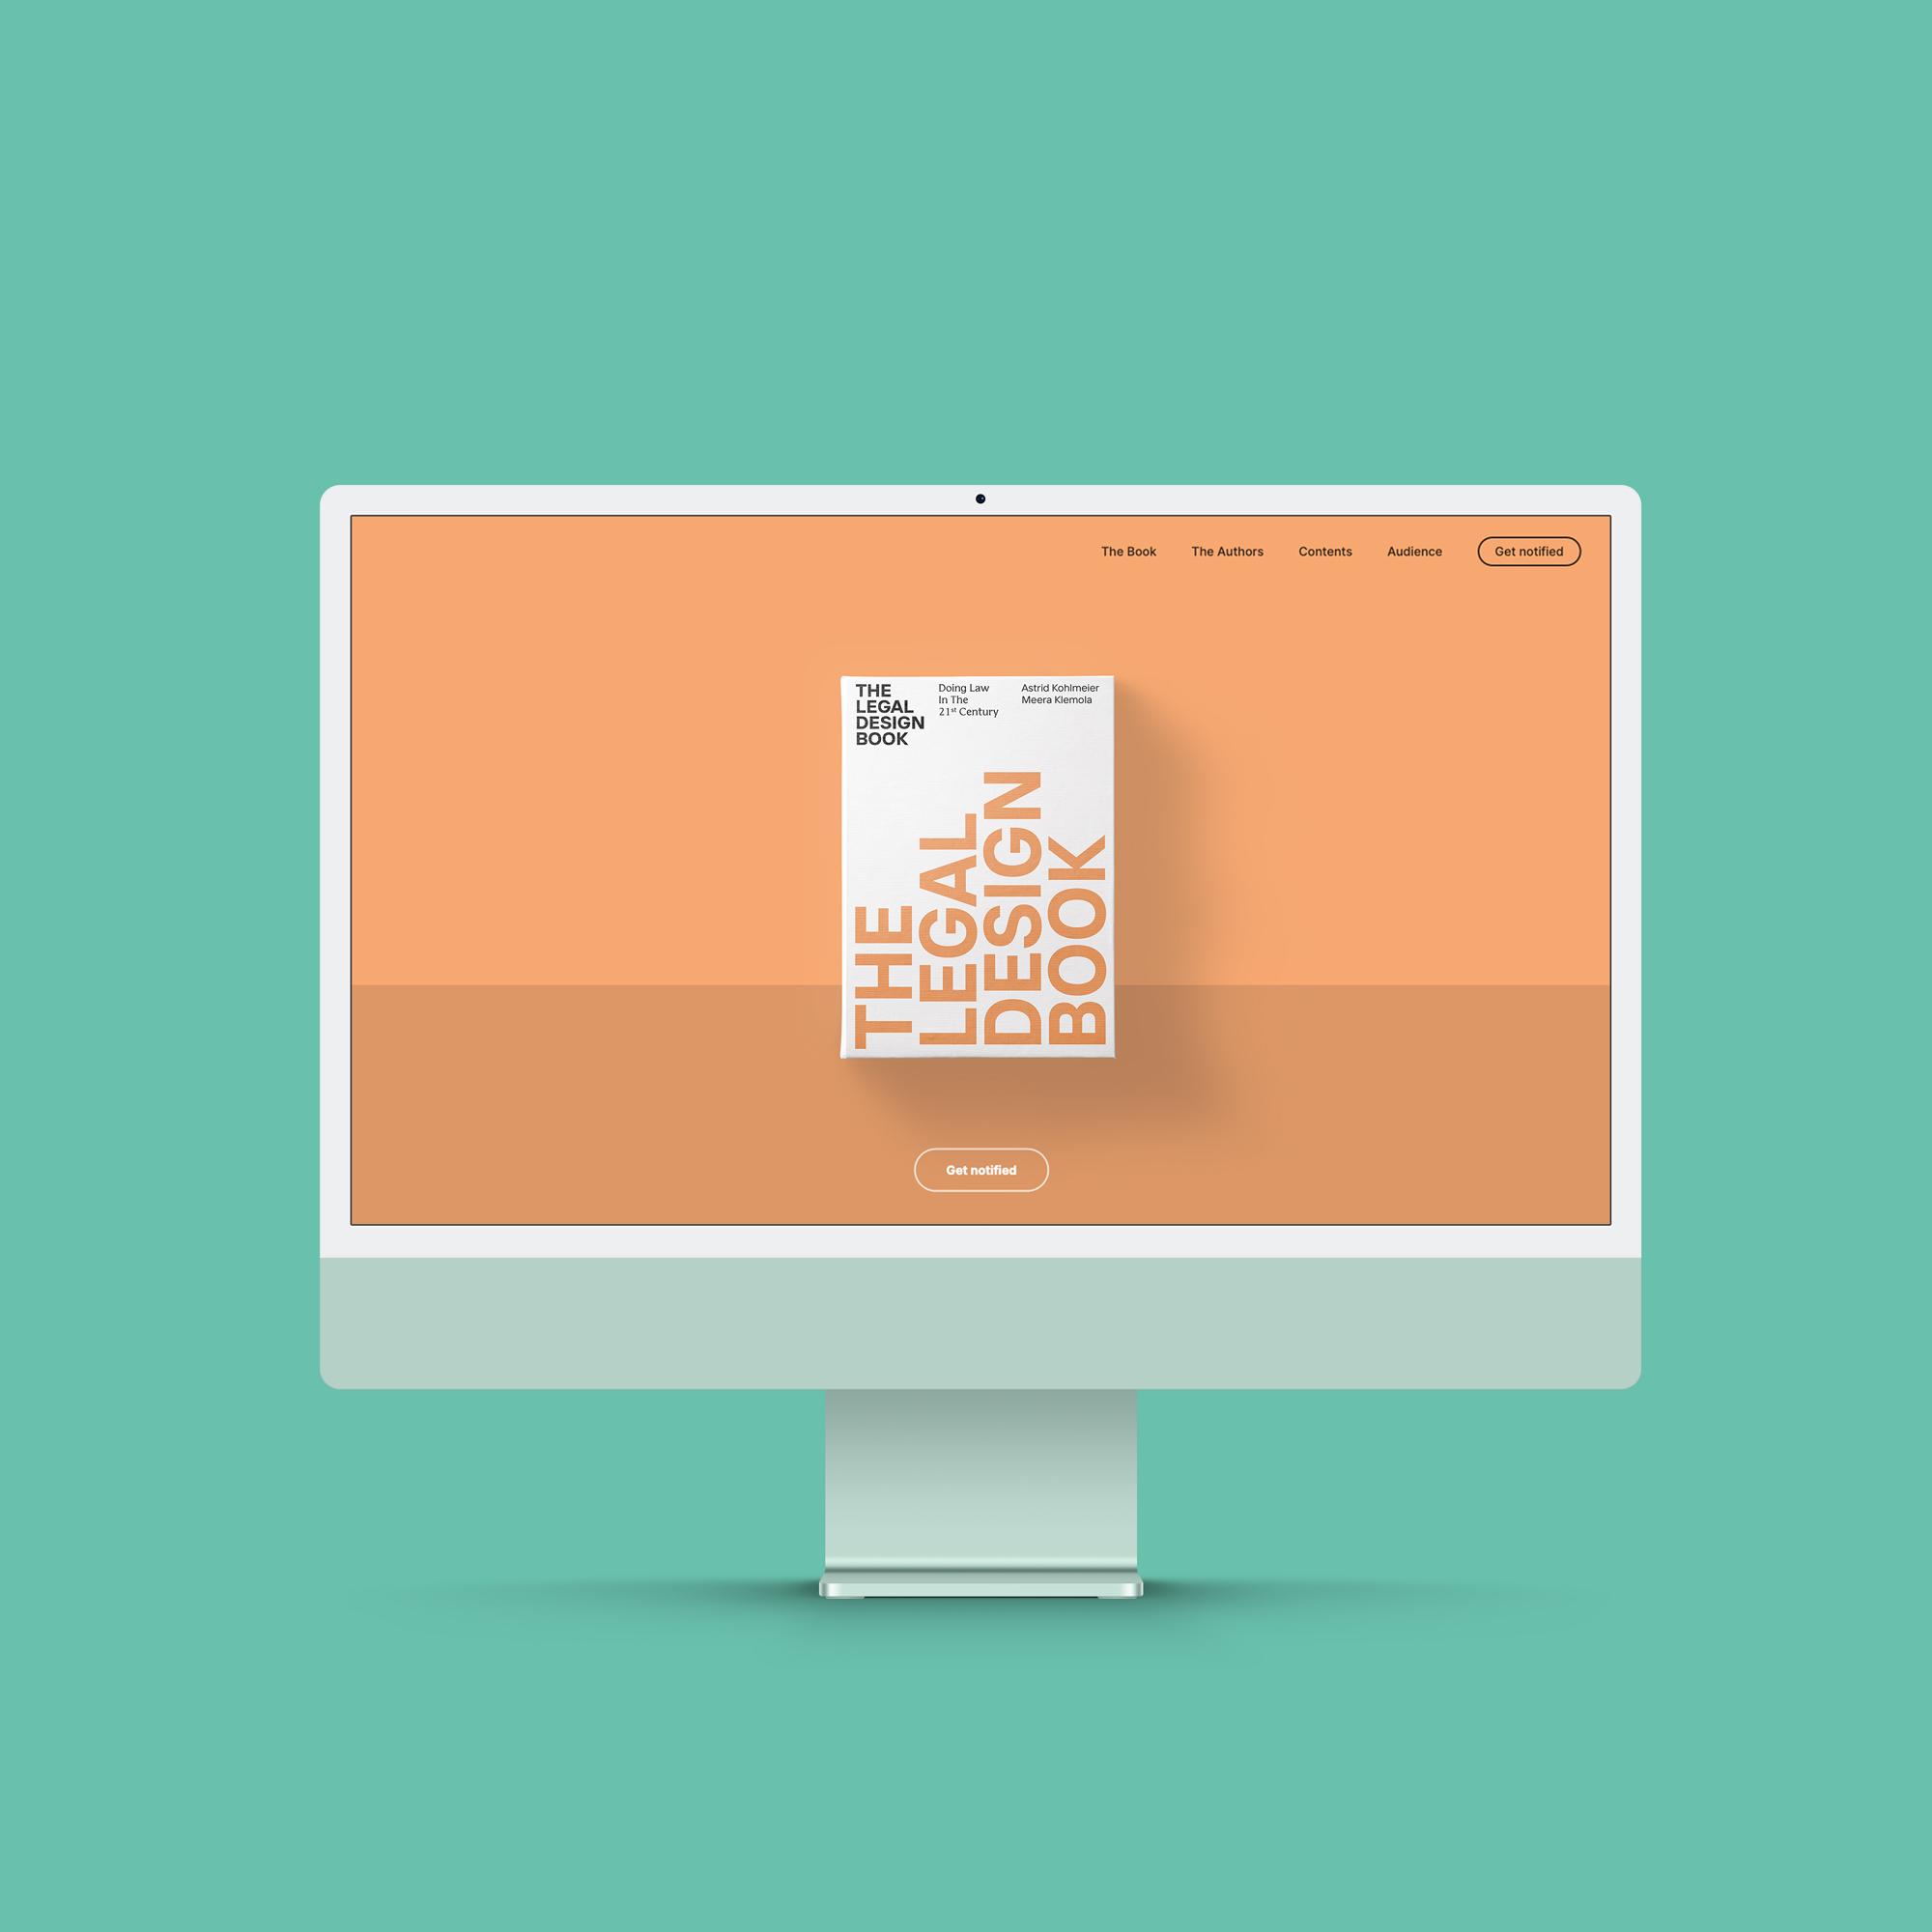 The Legal Design Book website image